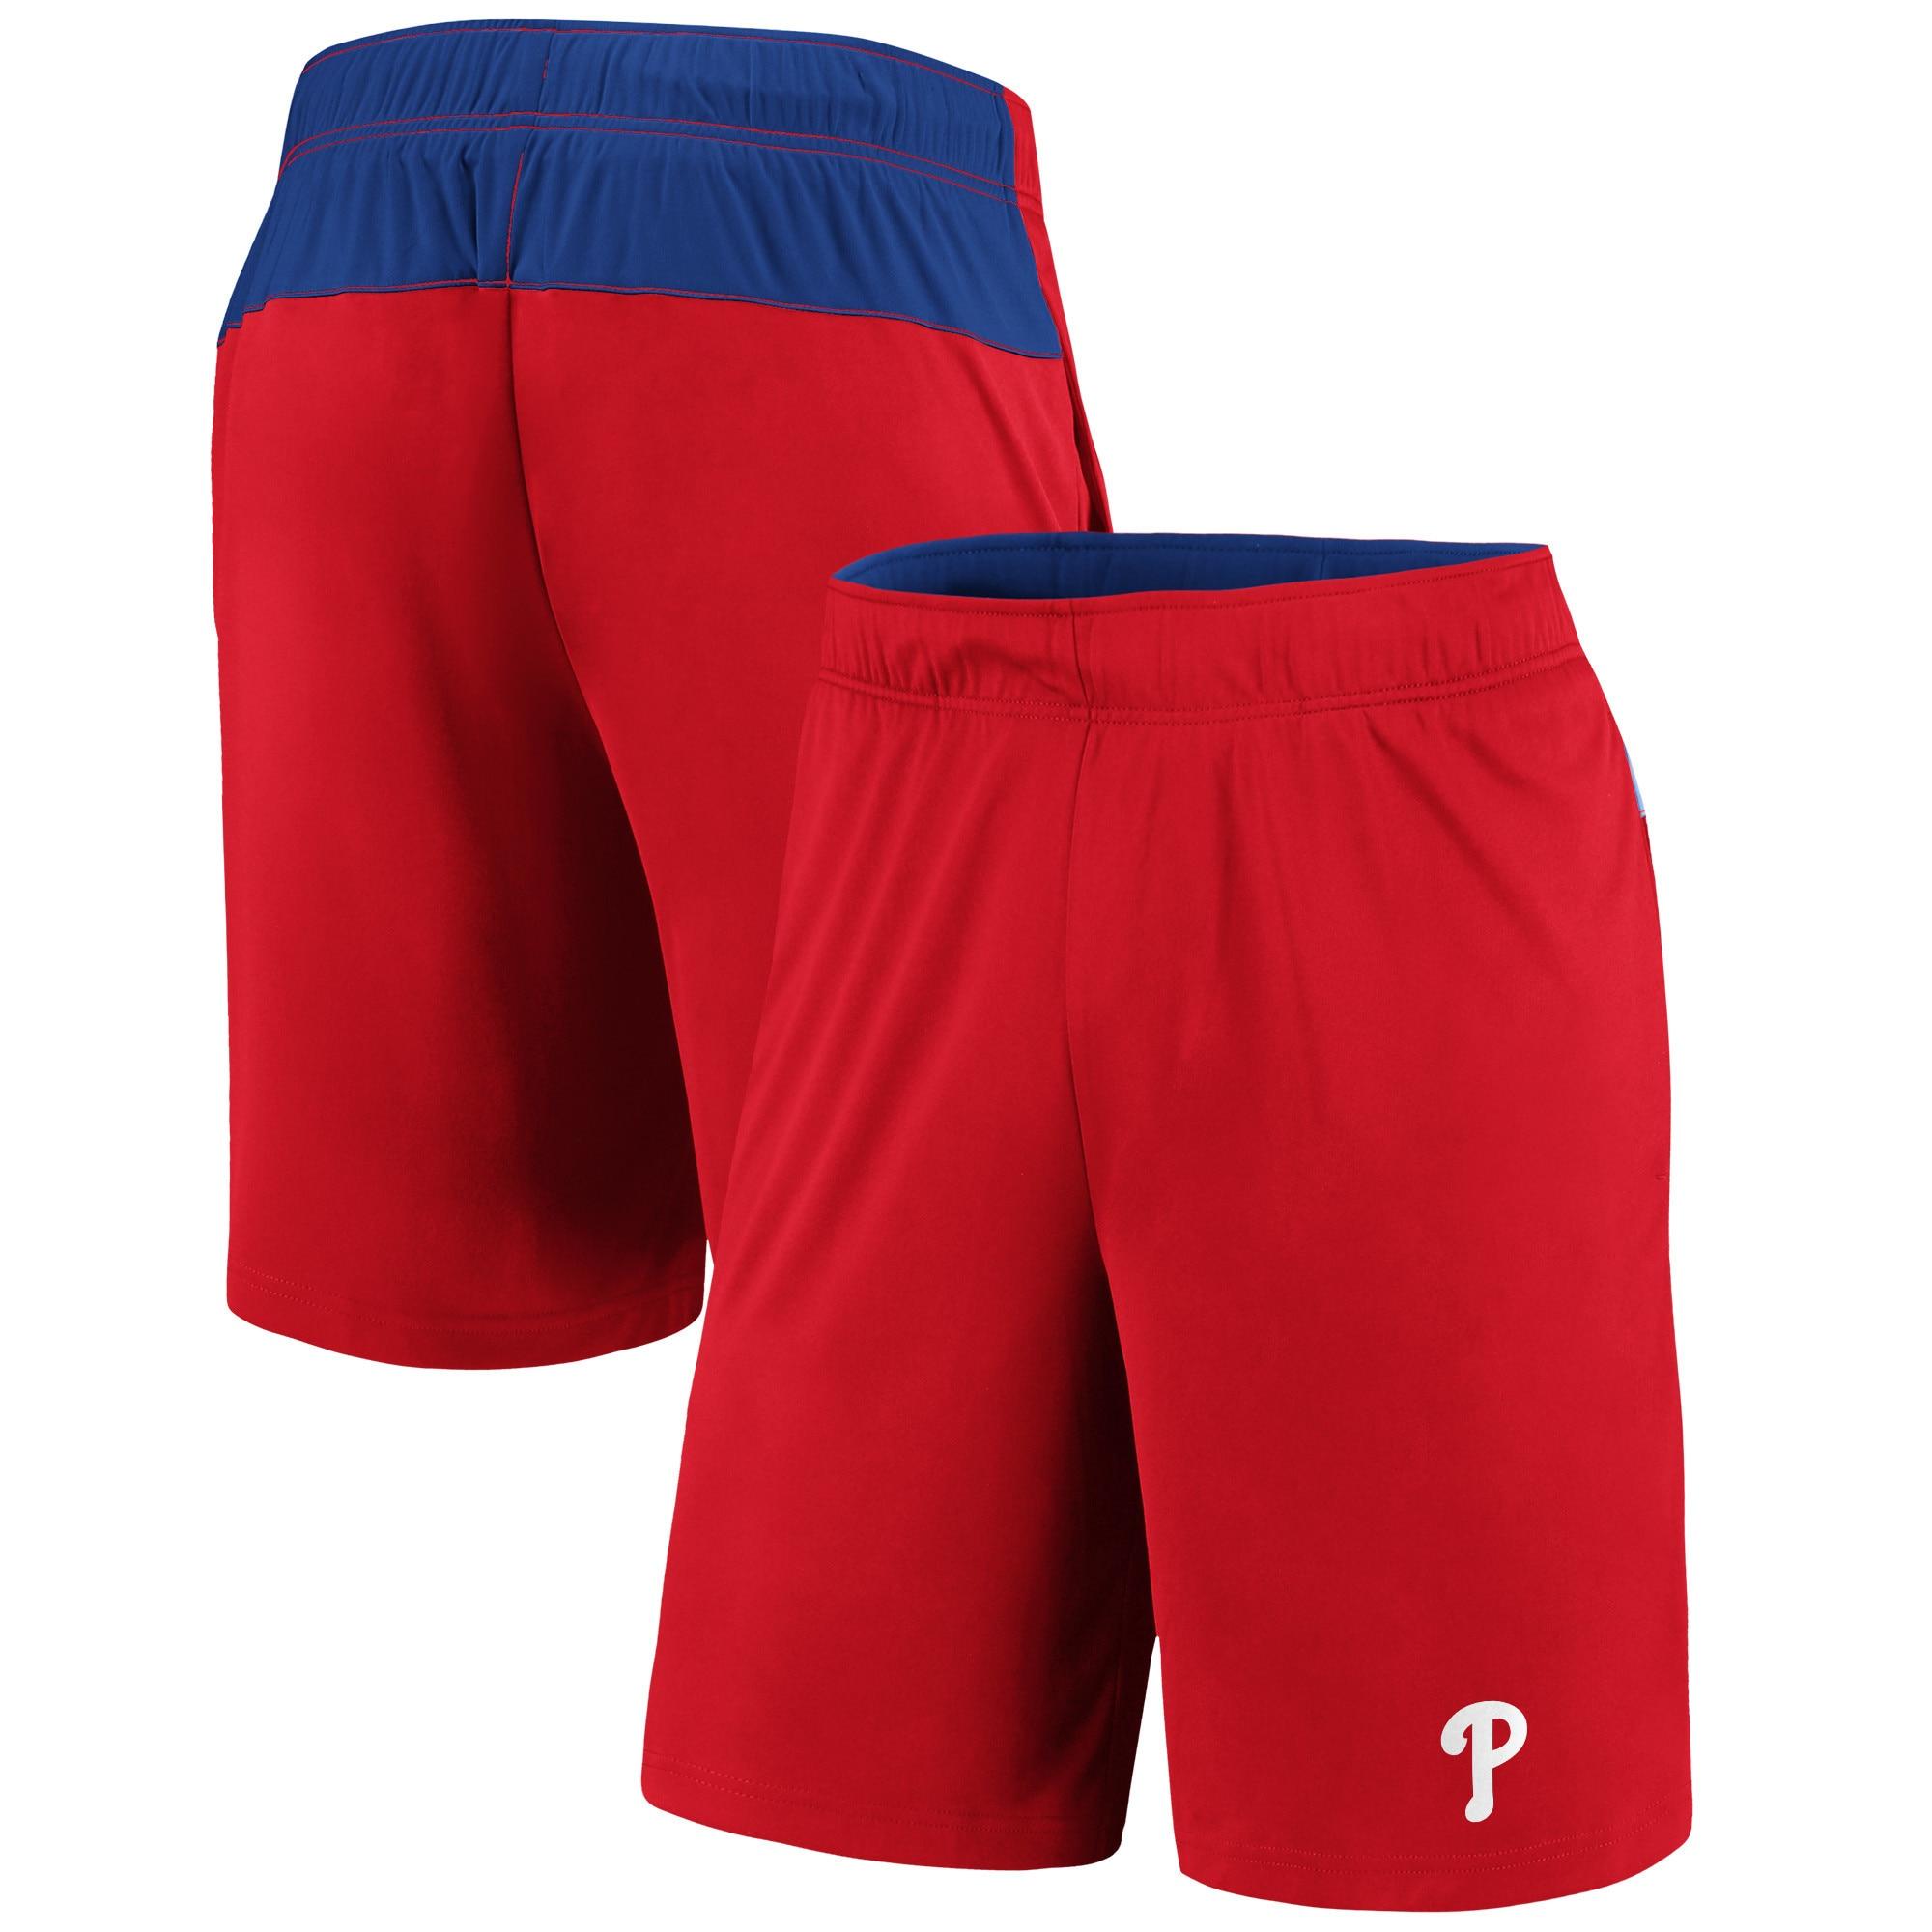 Philadelphia Phillies Fanatics Branded Primary Logo Shorts - Red